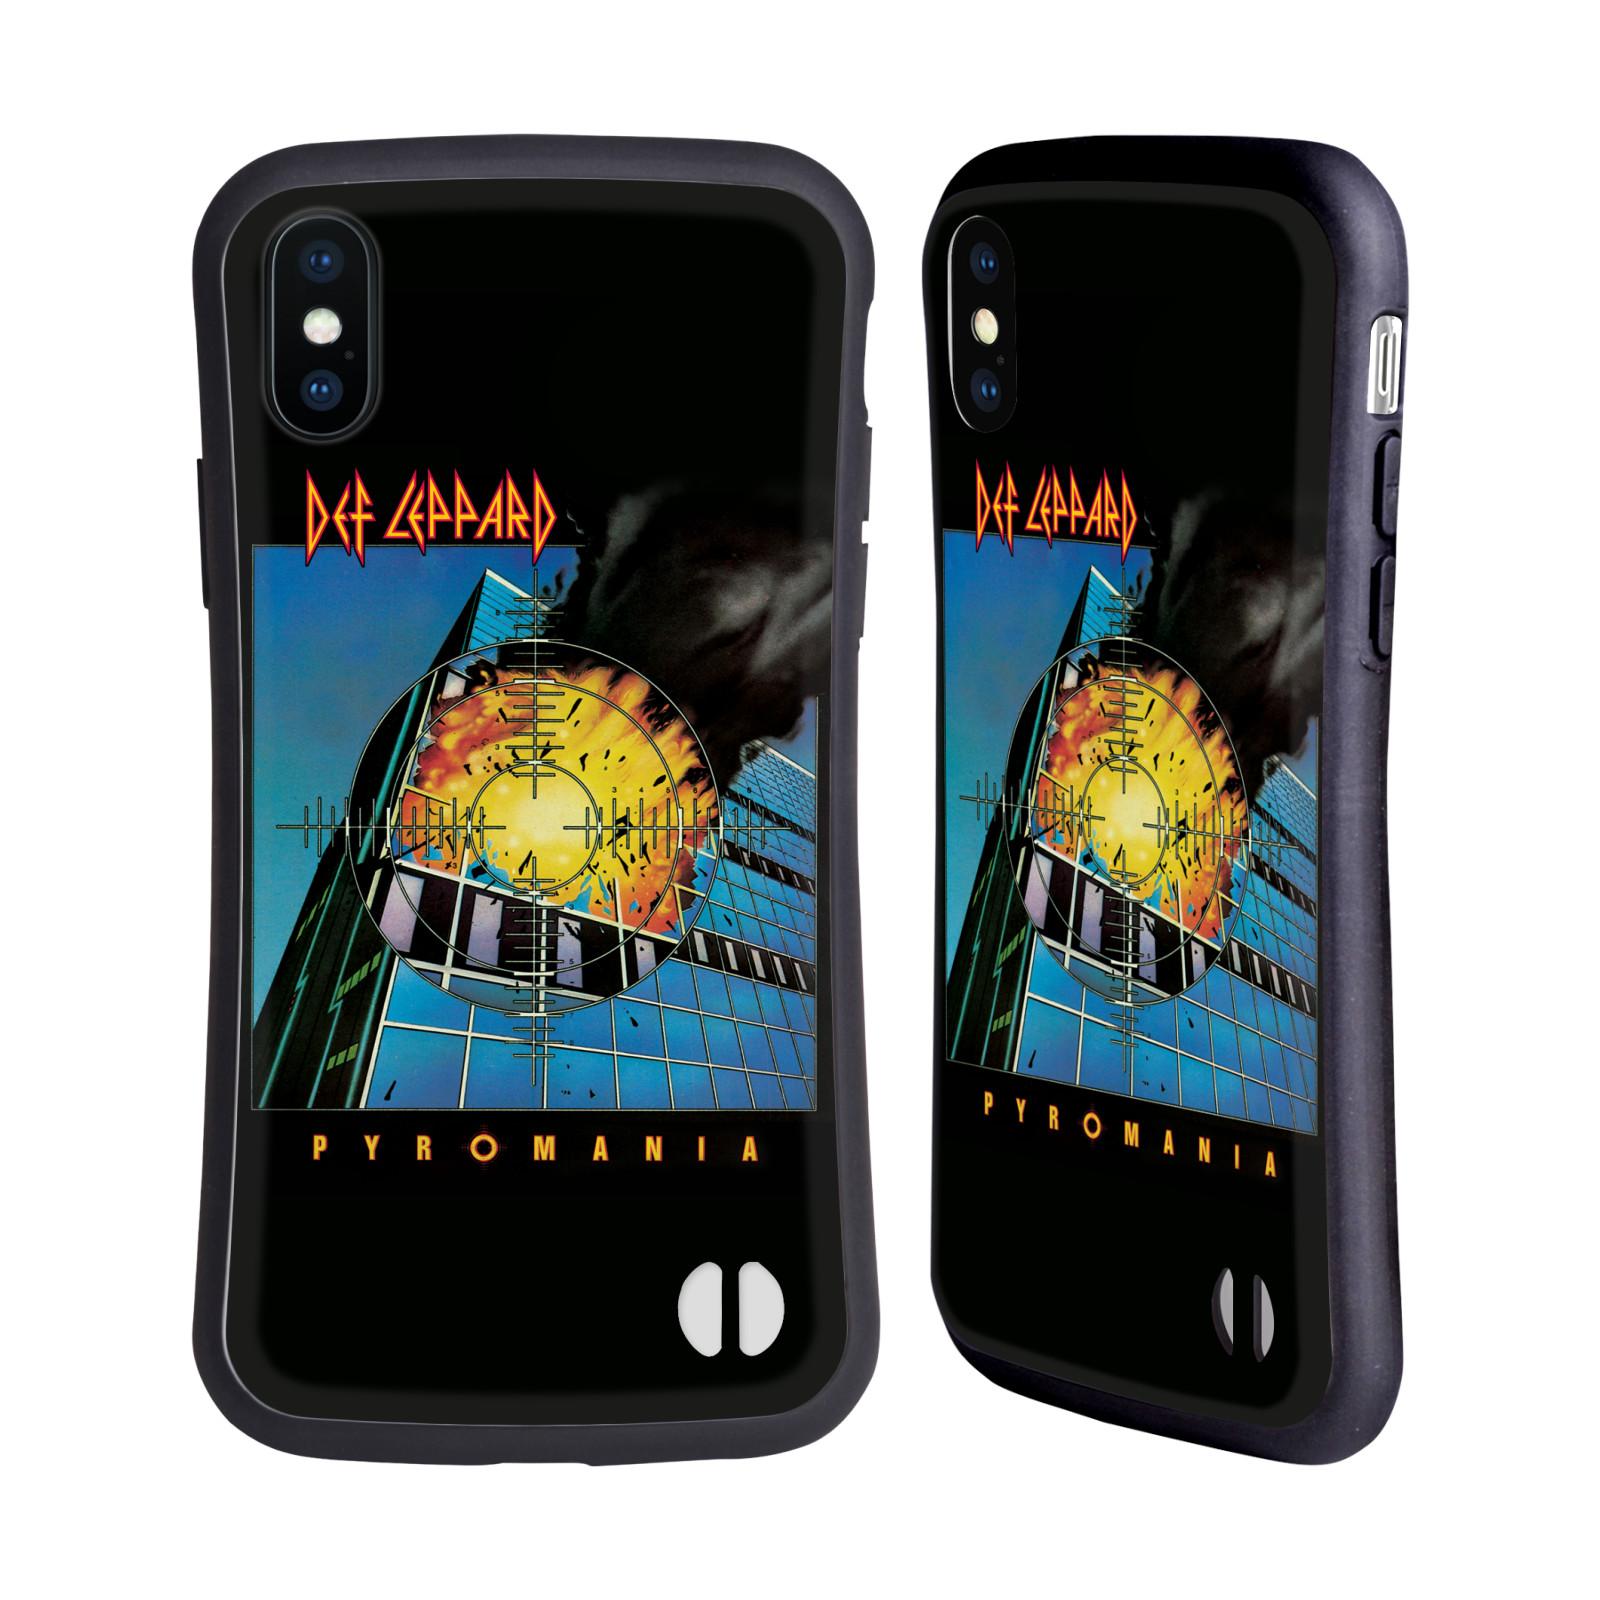 OFFICIAL-DEF-LEPPARD-ALBUMS-HYBRID-CASE-FOR-APPLE-iPHONES-PHONES